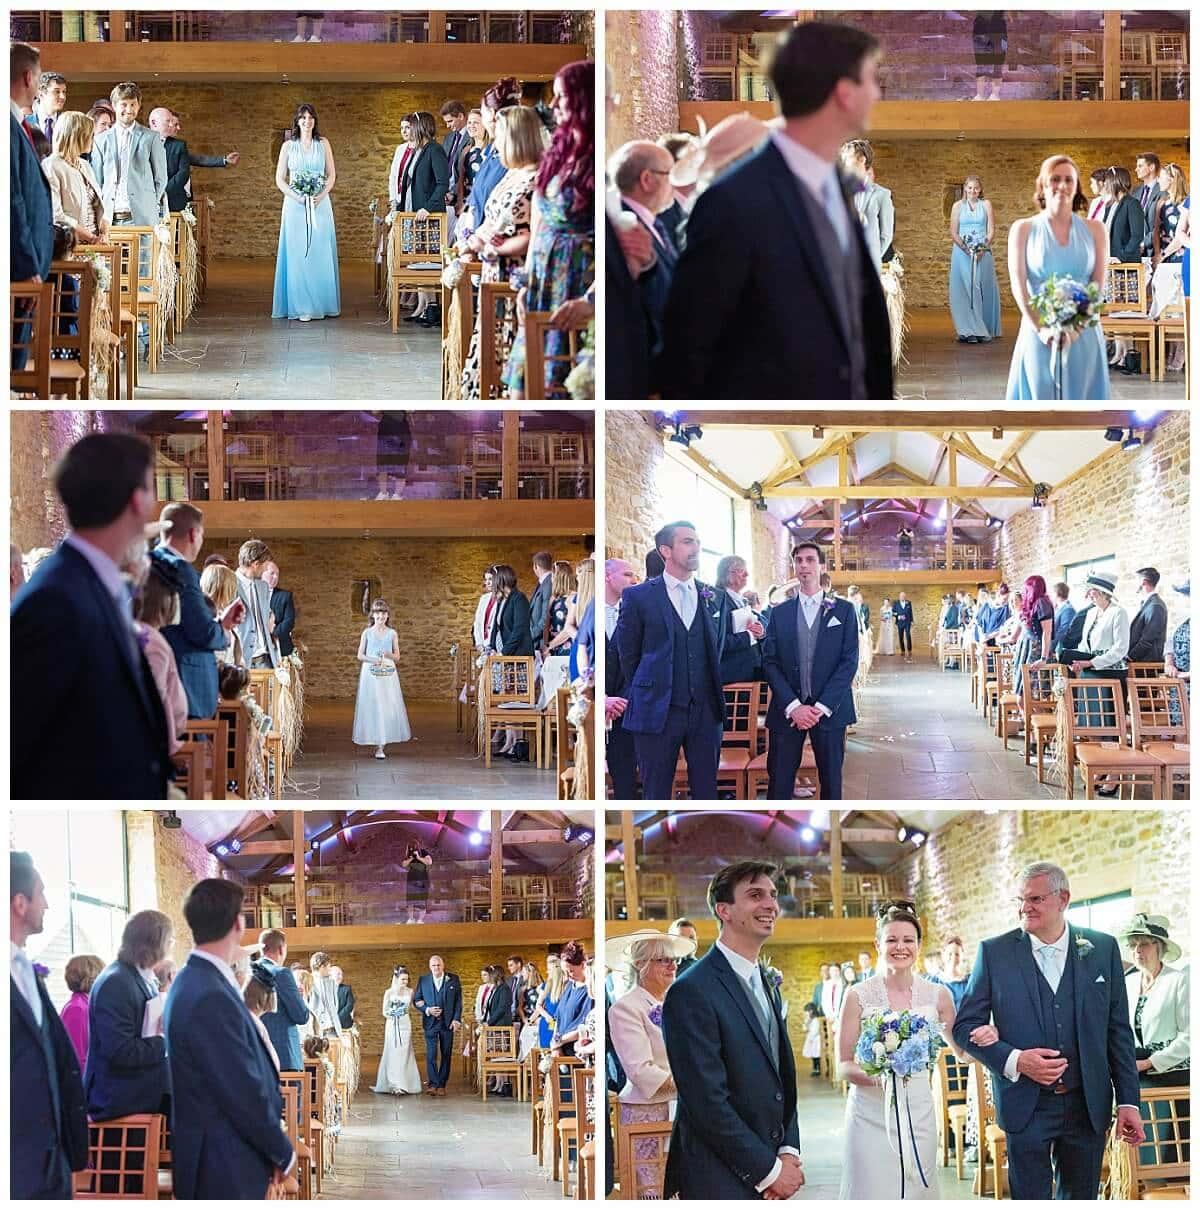 Dodford Manor wedding ceremony